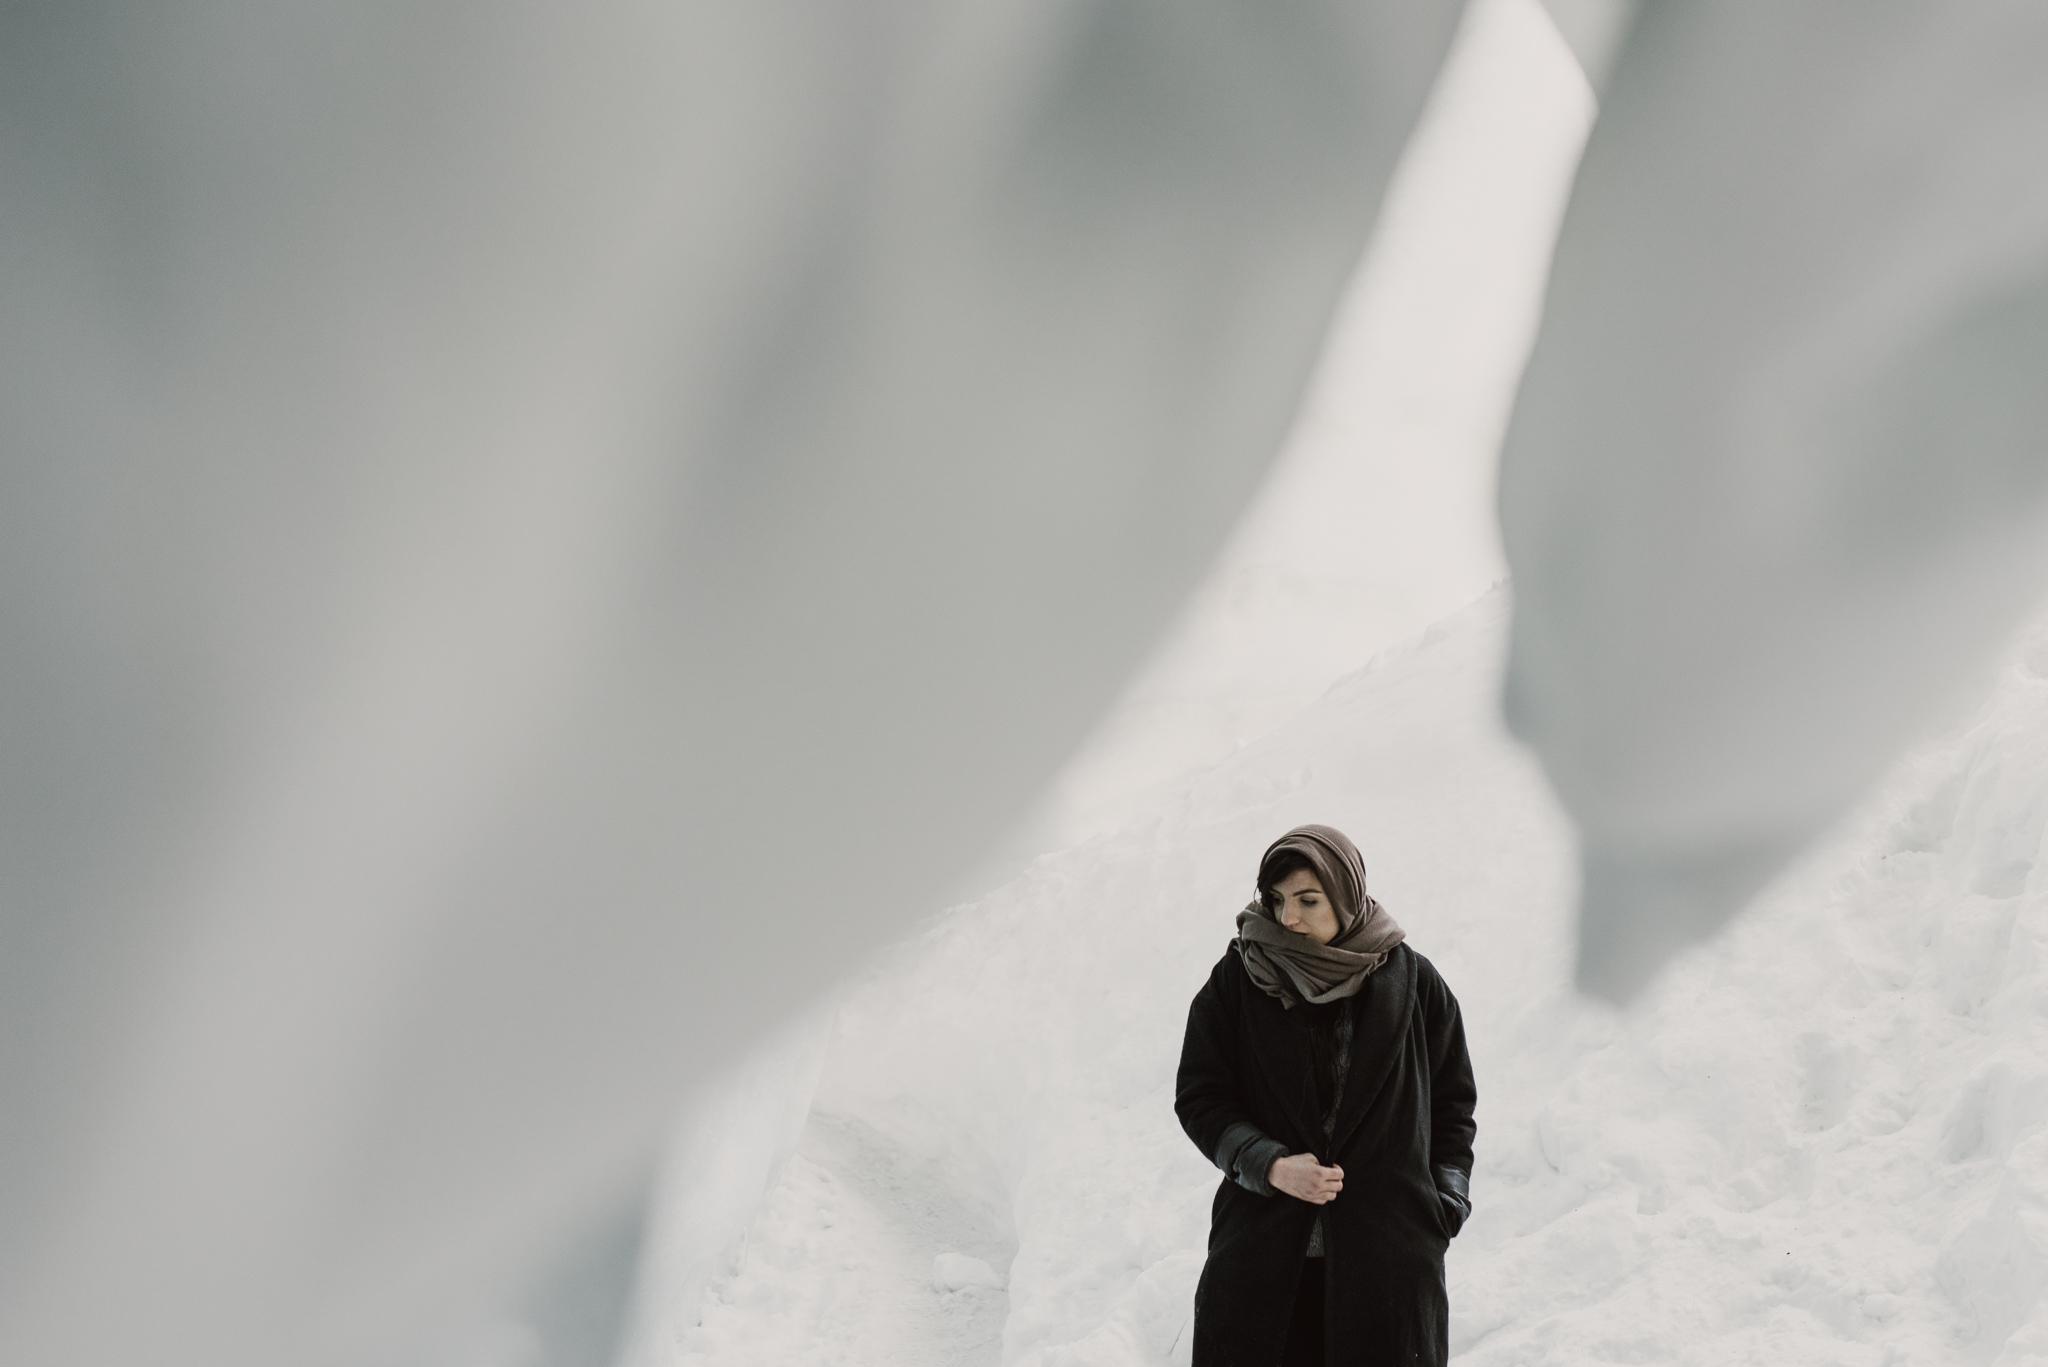 ©The-Ryans-Photo---Athabasca-Glacier,-Ice-Cave-047.jpg